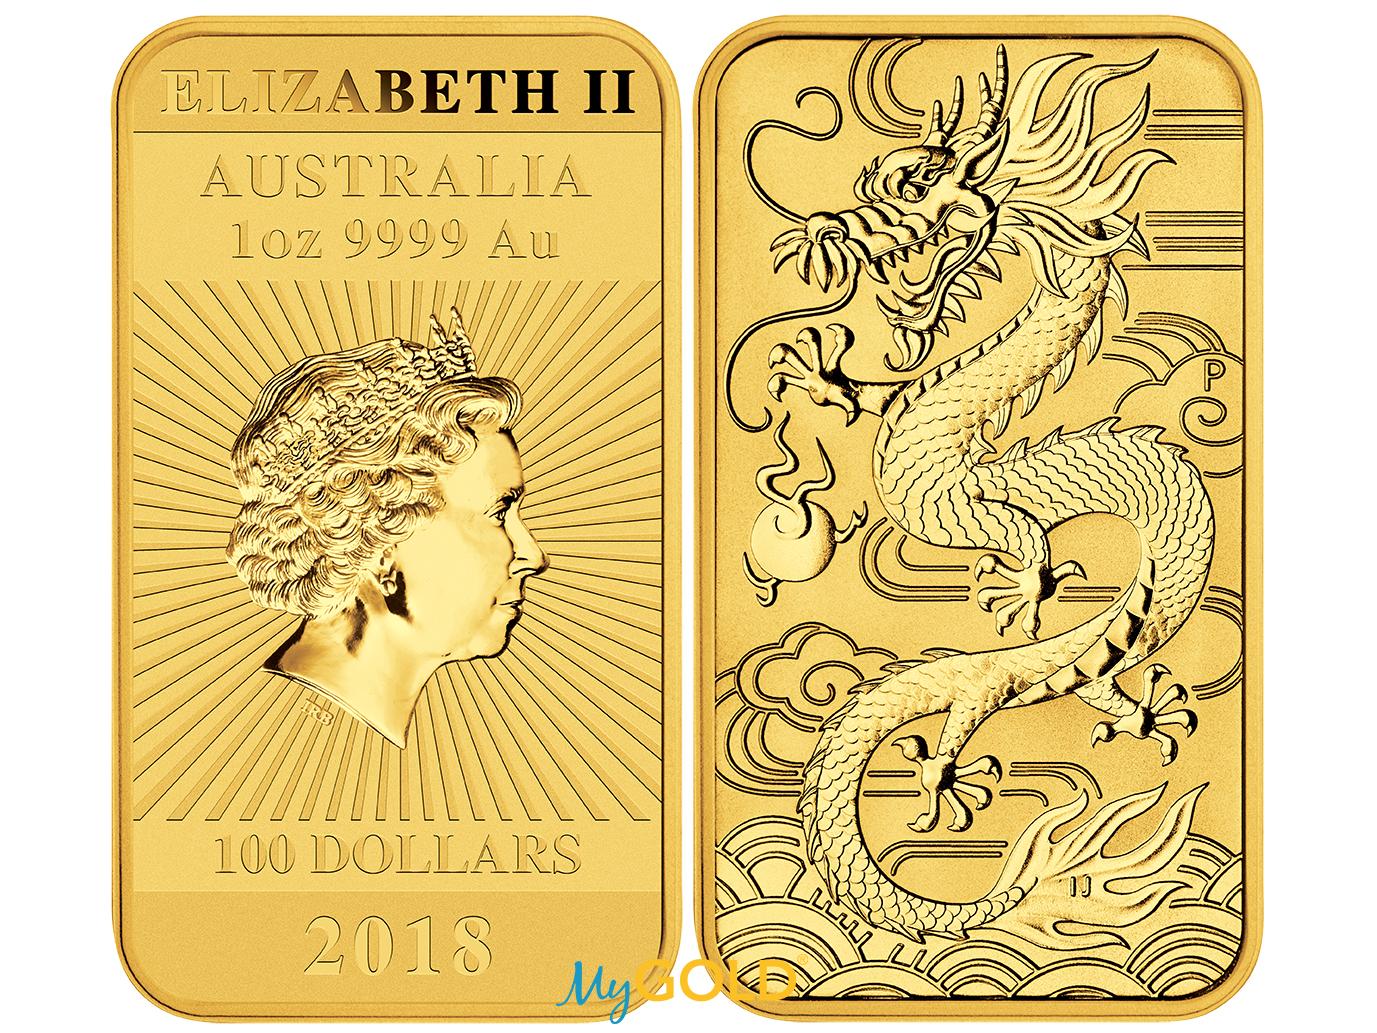 Buy 1oz Perth Mint Gold Rectangular Dragon Bullion Bar from MyGold.